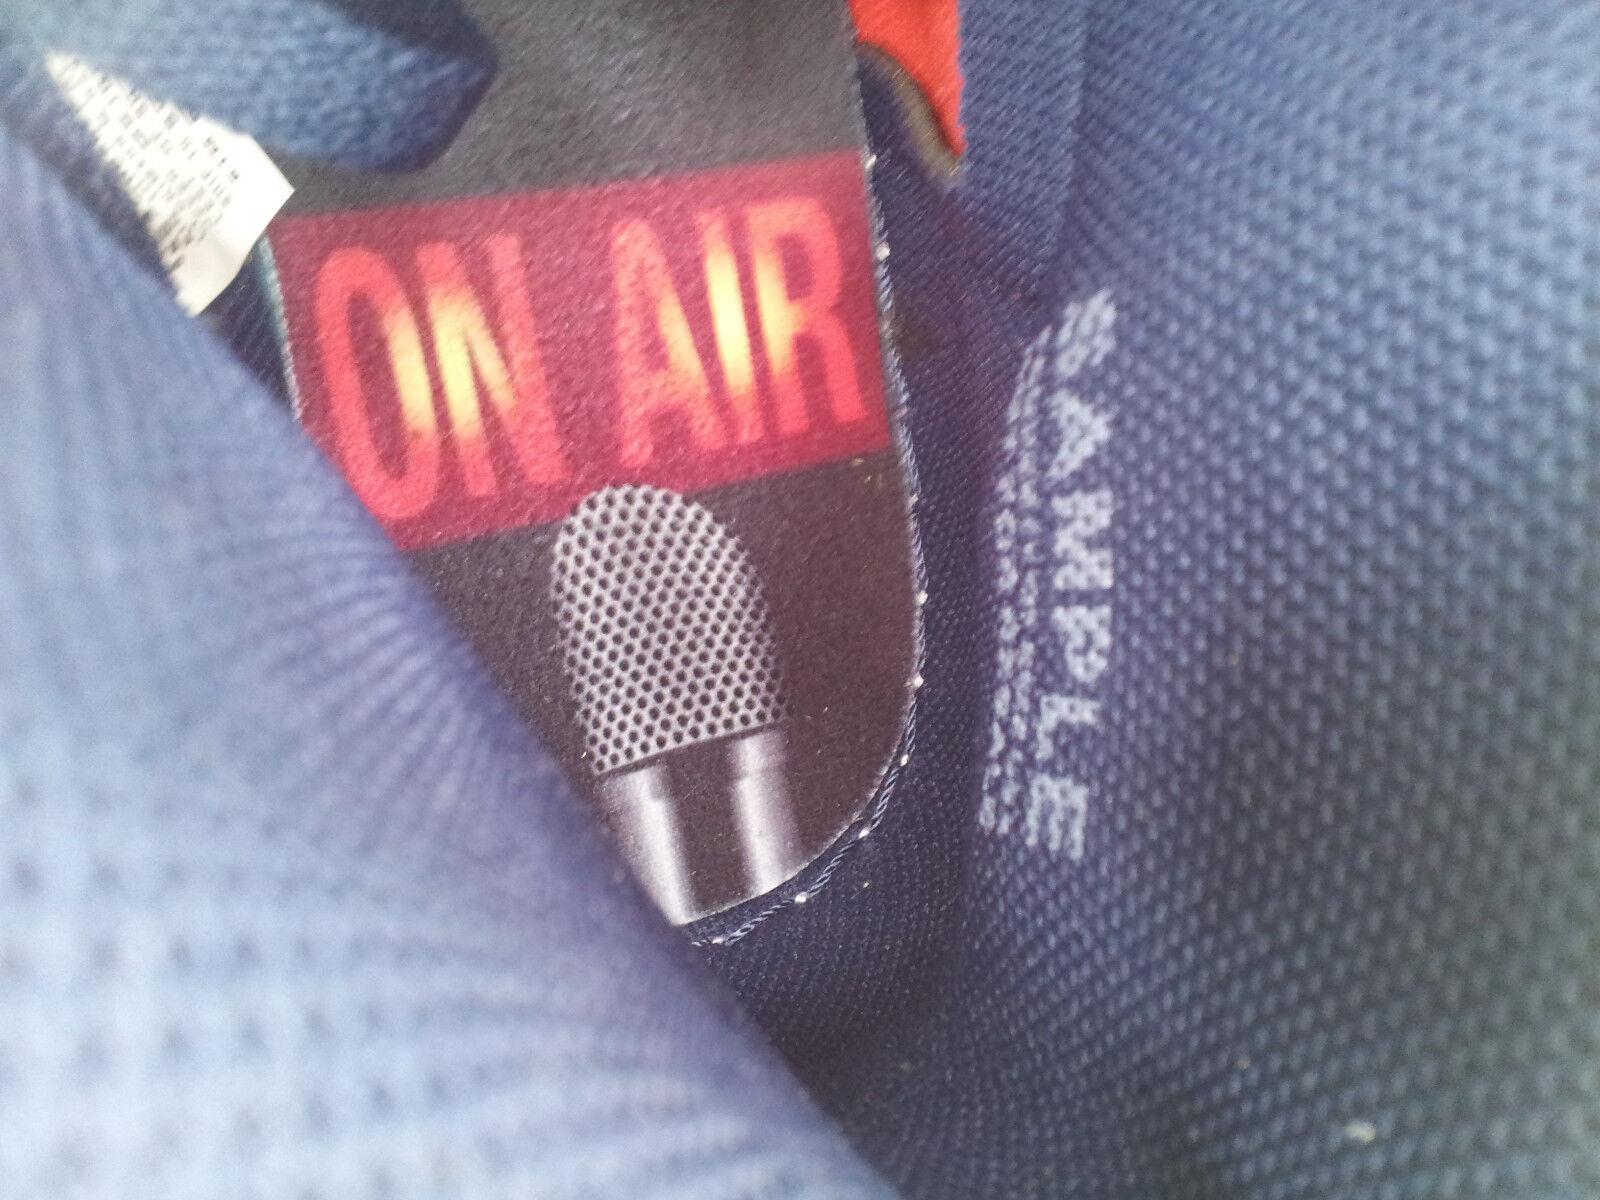 Nike air jordan 1 letterman retro - hohe og david letterman 1 stichprobe turnschuhe mens größe 9. ROT 8d7ab6